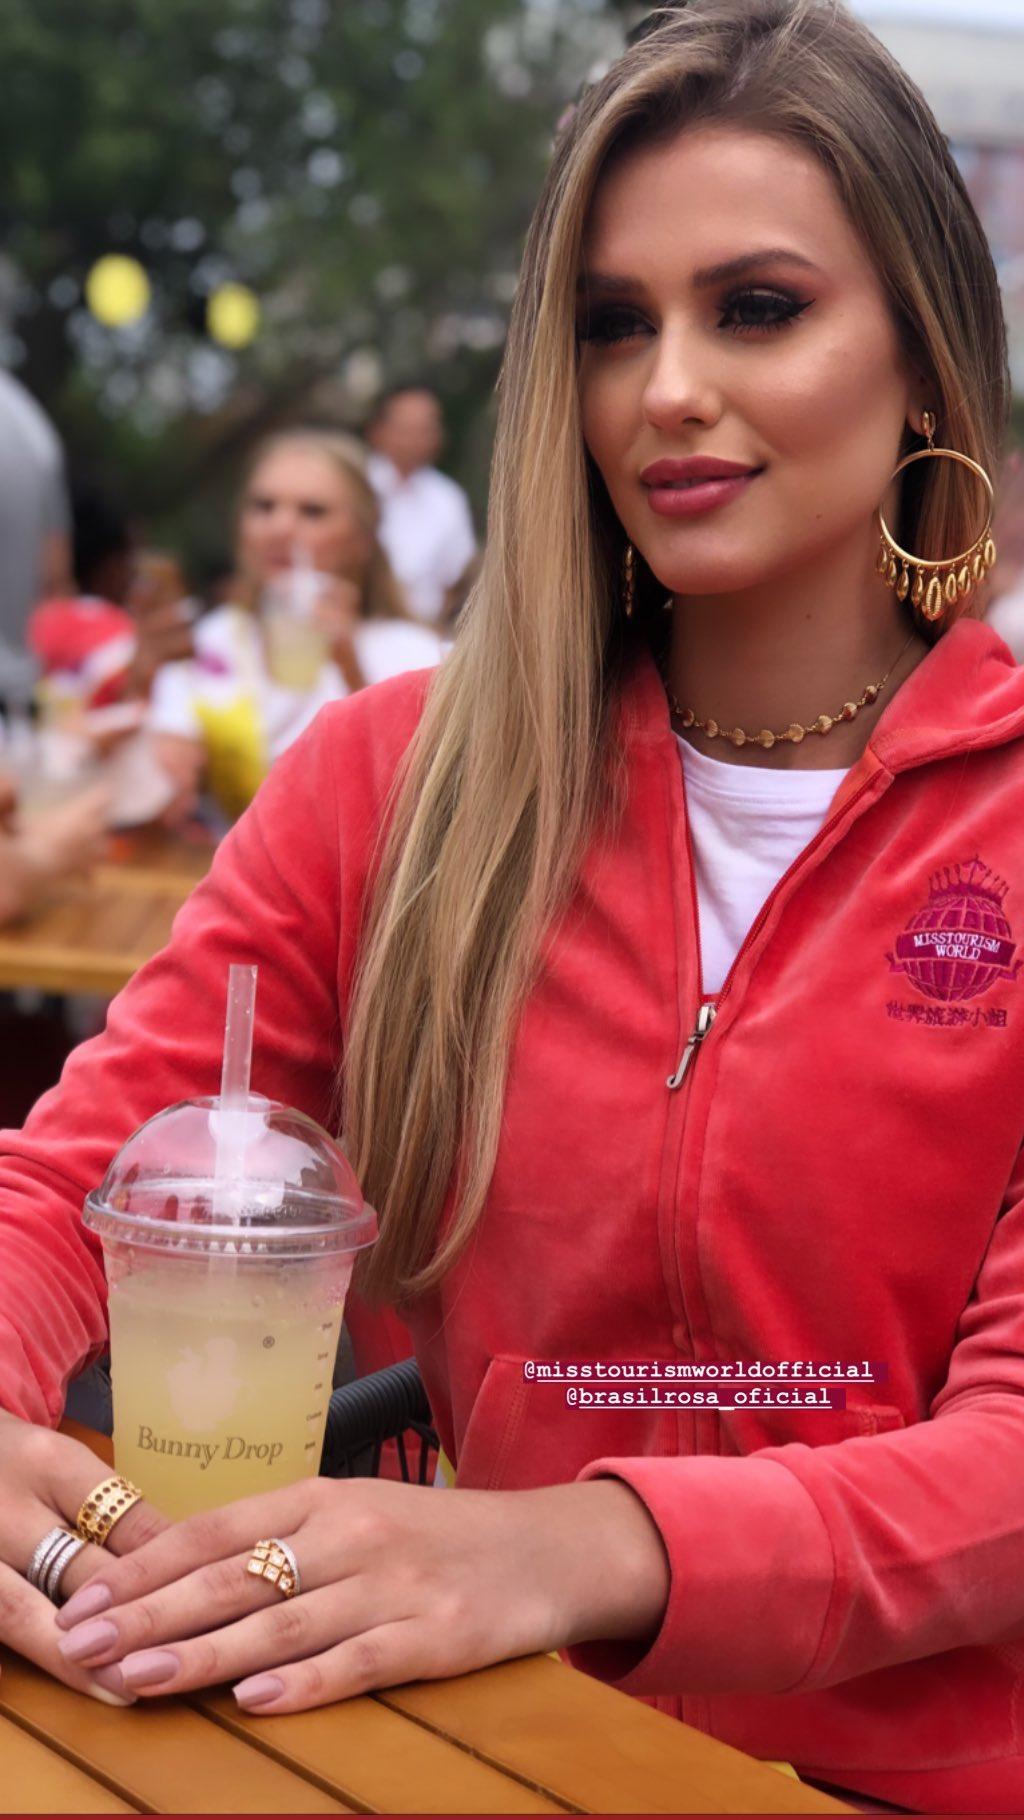 marcella kozinski de barros, 3rd runner-up de miss tourism world 2019. - Página 5 71187210